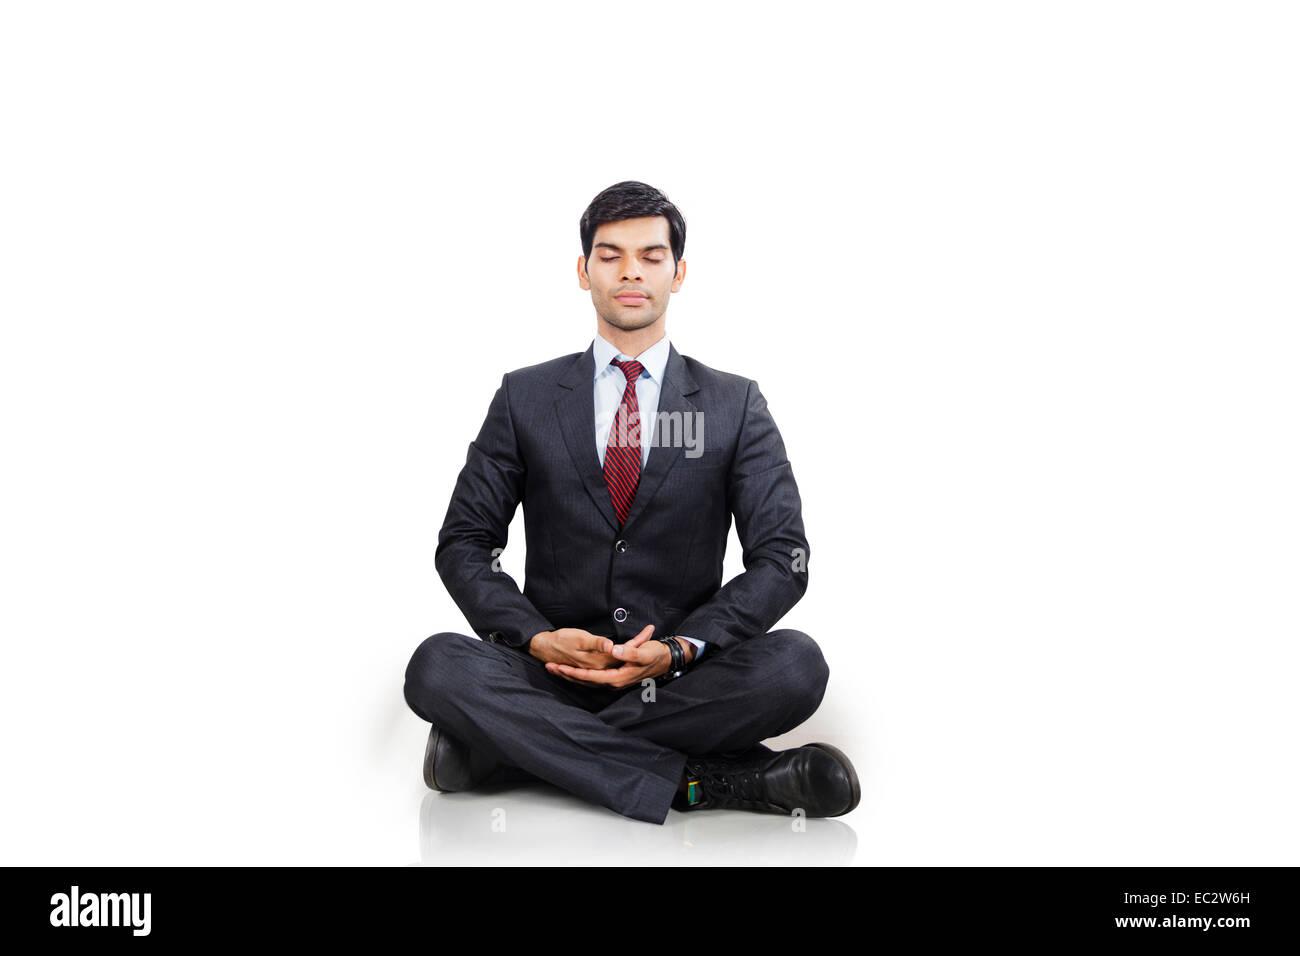 meditation businessman office. Indian Business Man Yoga Meditation Businessman Office